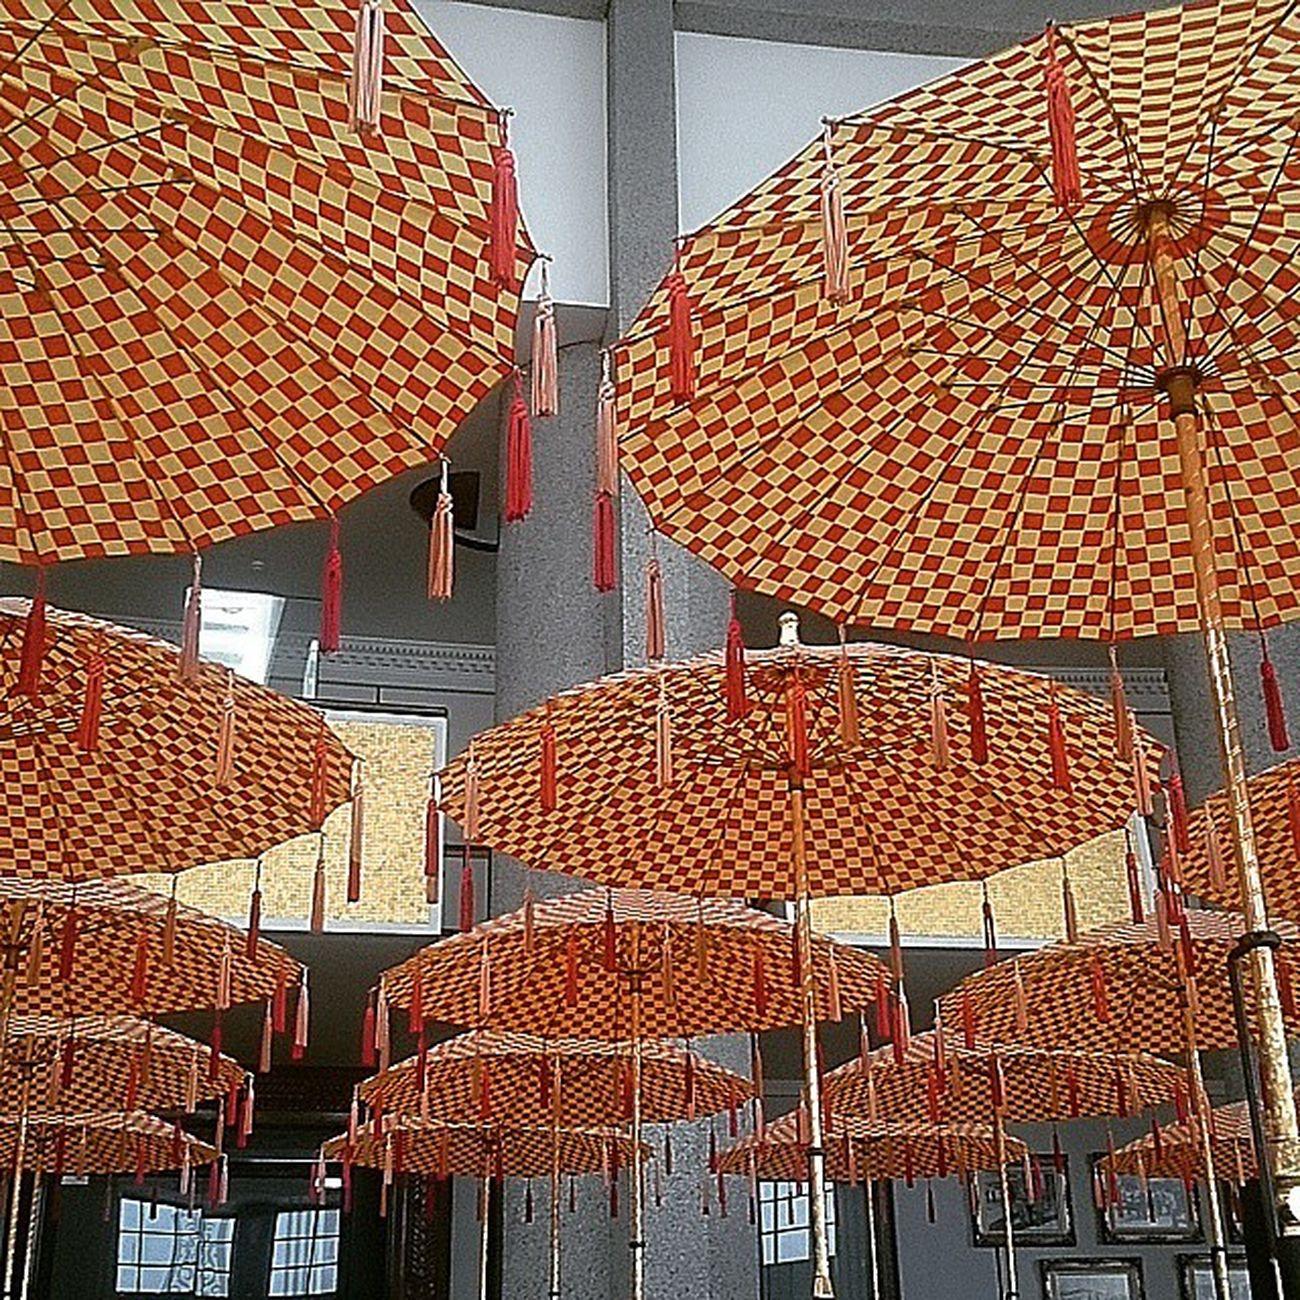 Payung Kawan (Royal Umbrellas) ☔☔☔ Payungkawan Royalumbrellas Shalehslimitlessboundaries Thefrankophiles thefrankophile frankophile frankophiles flashpacking backpacking backpacking2015 flashpacking2015 koozymwah nomadictours nomadictoors bandarseri 4pax 5pax 6pax Roadtrip leg2of7in2weeks